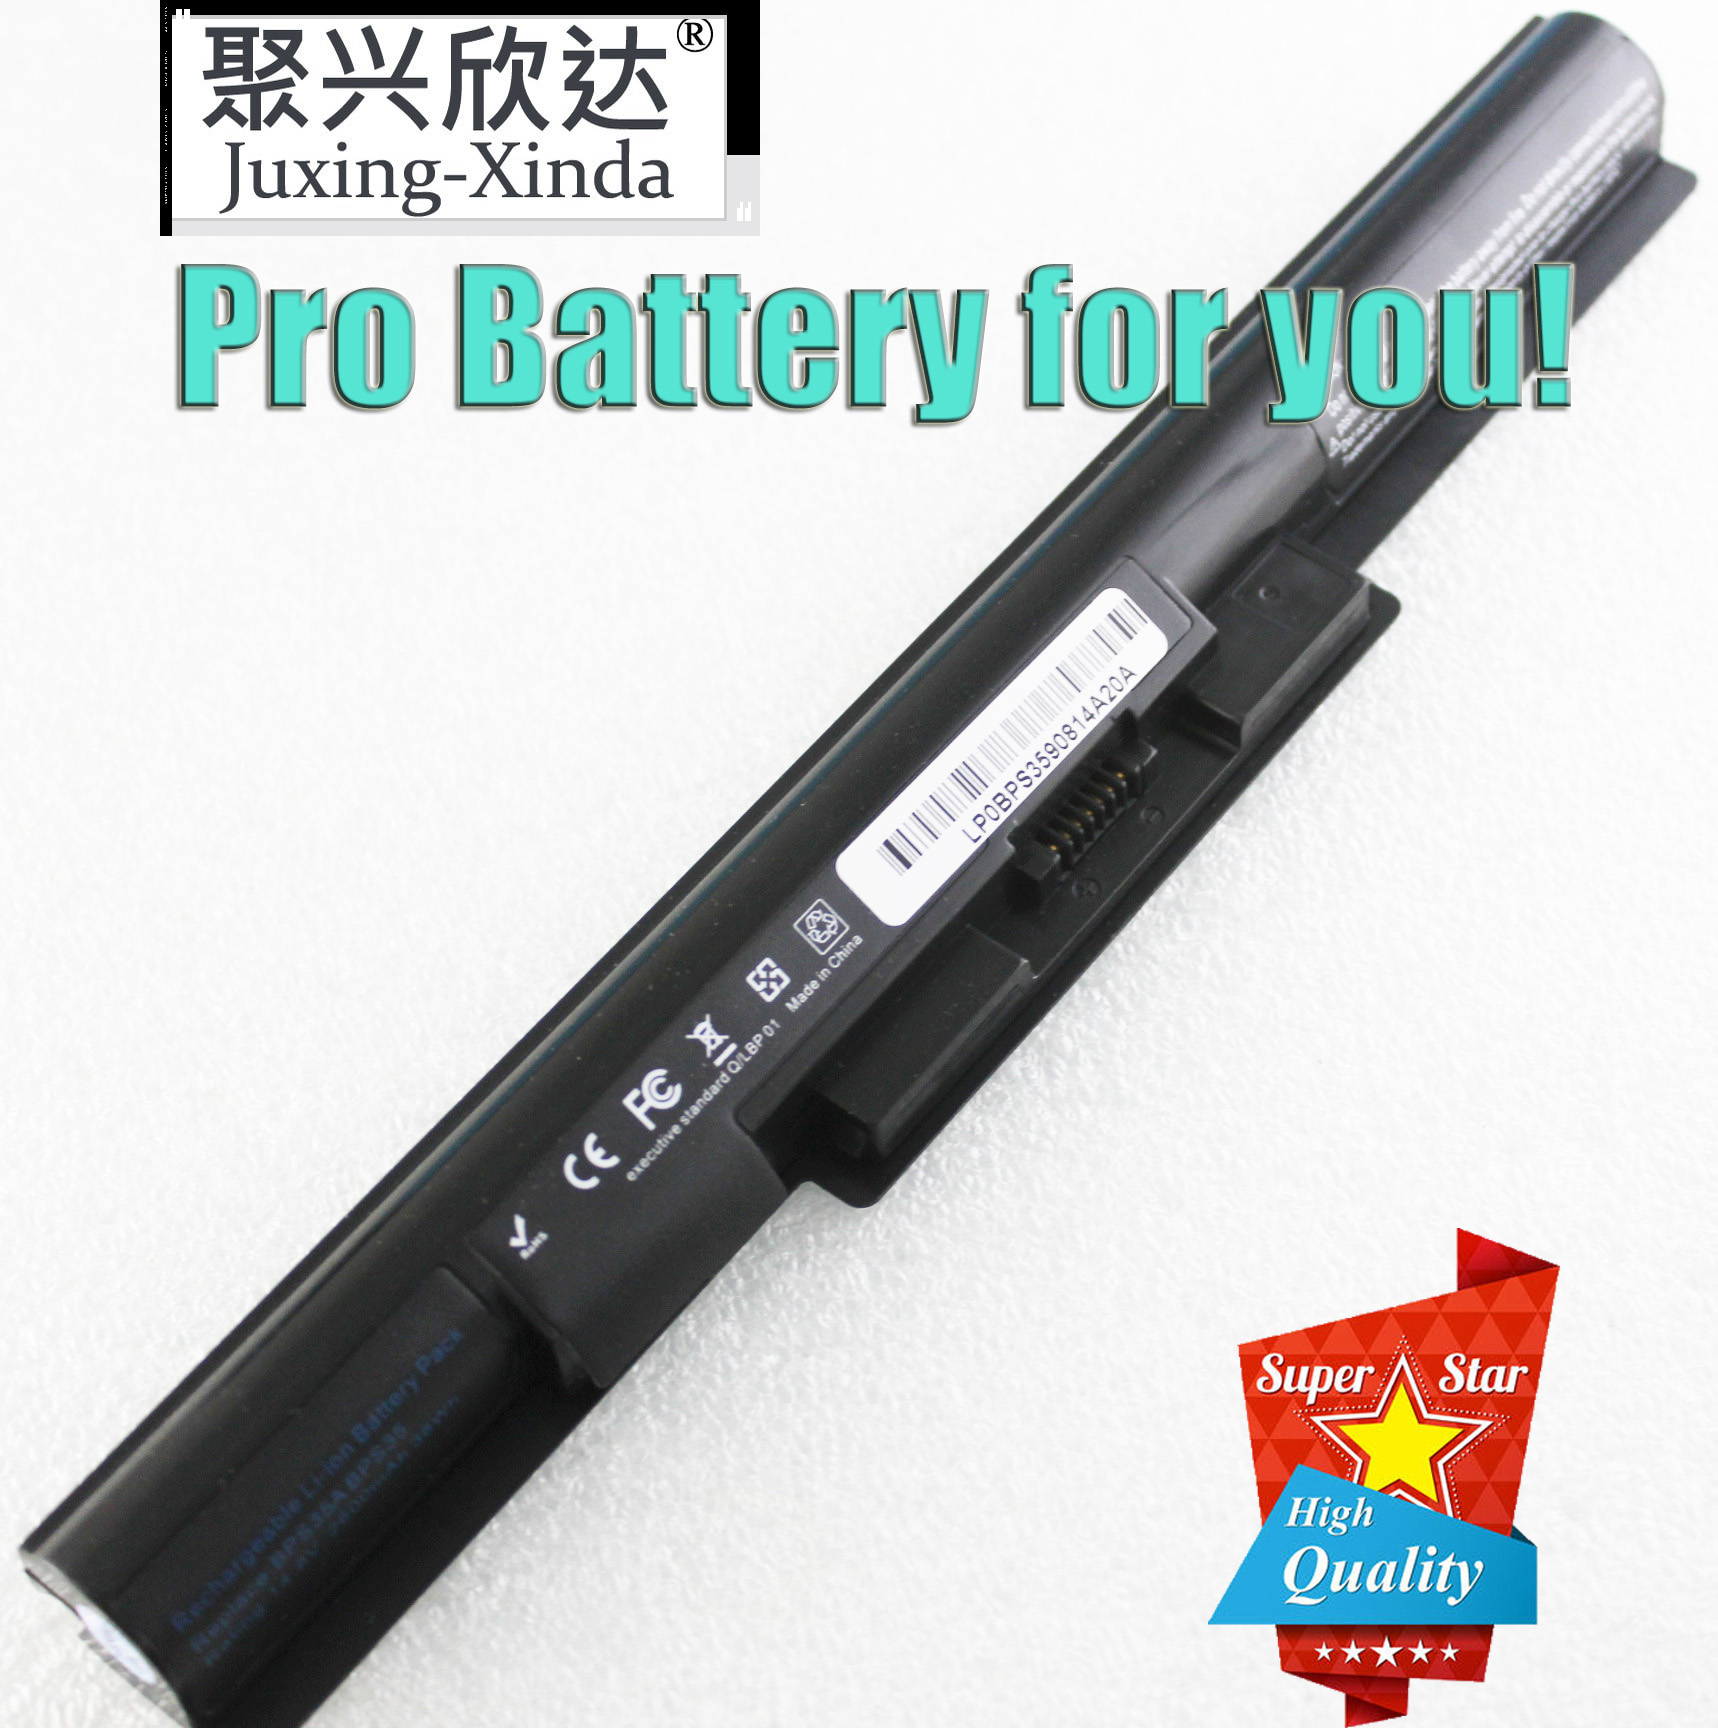 Купить аккумулятор для ноутбука sony vaio fit 14e 15e svf1521a2e svf15217sc